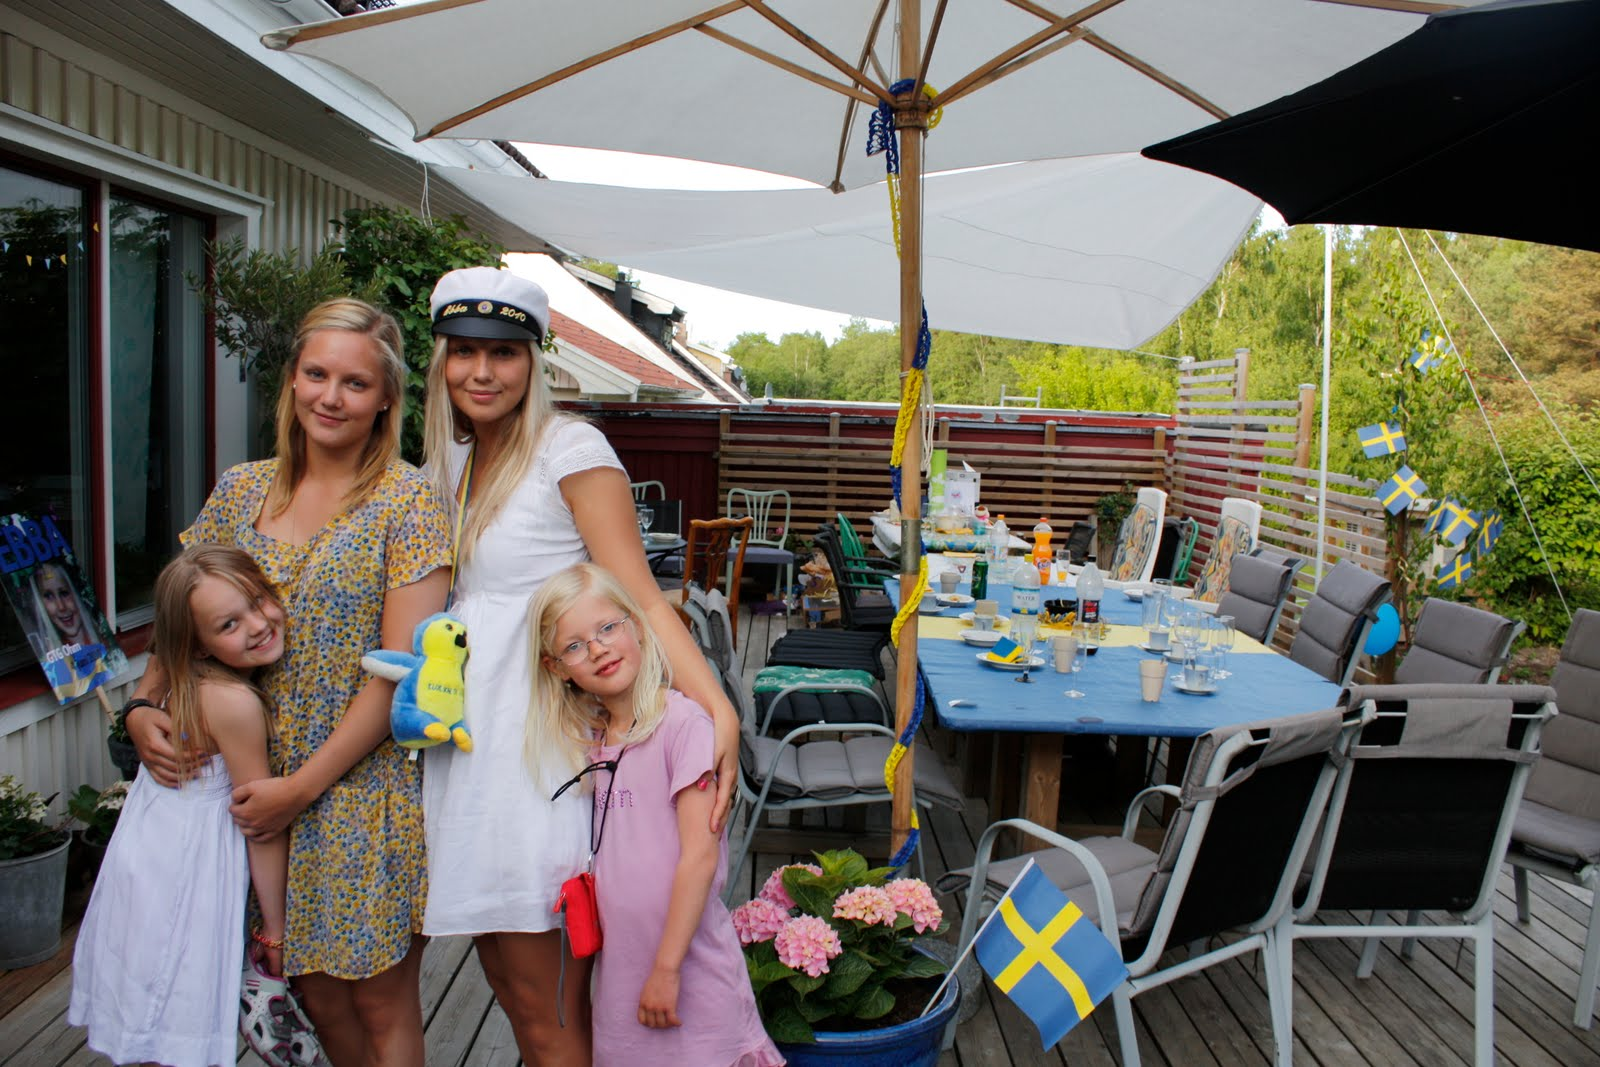 pengar ledsagare fantasi i Göteborg